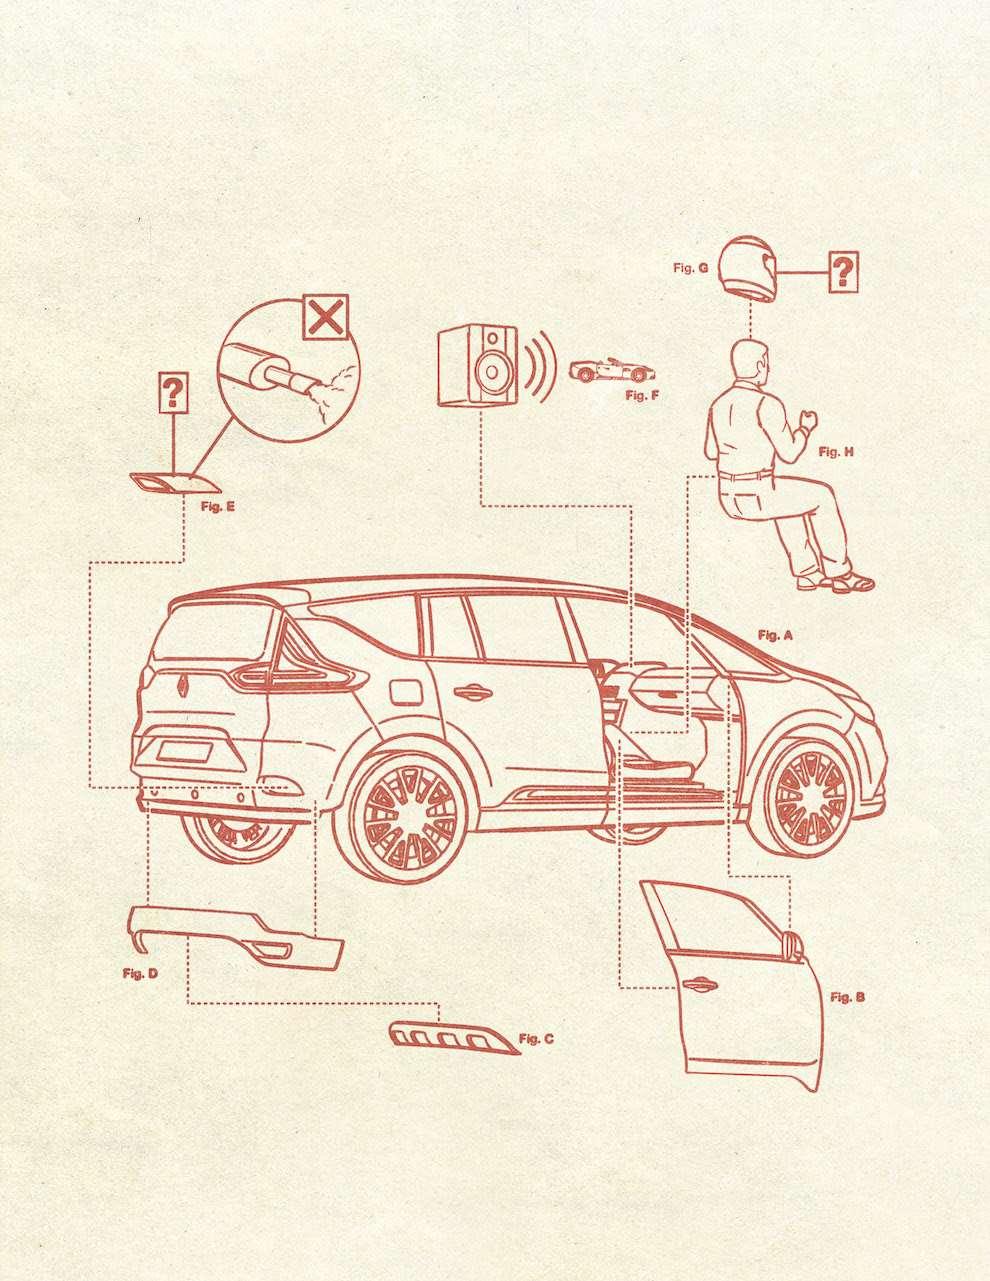 Tobatron, Infographic illustration of a car